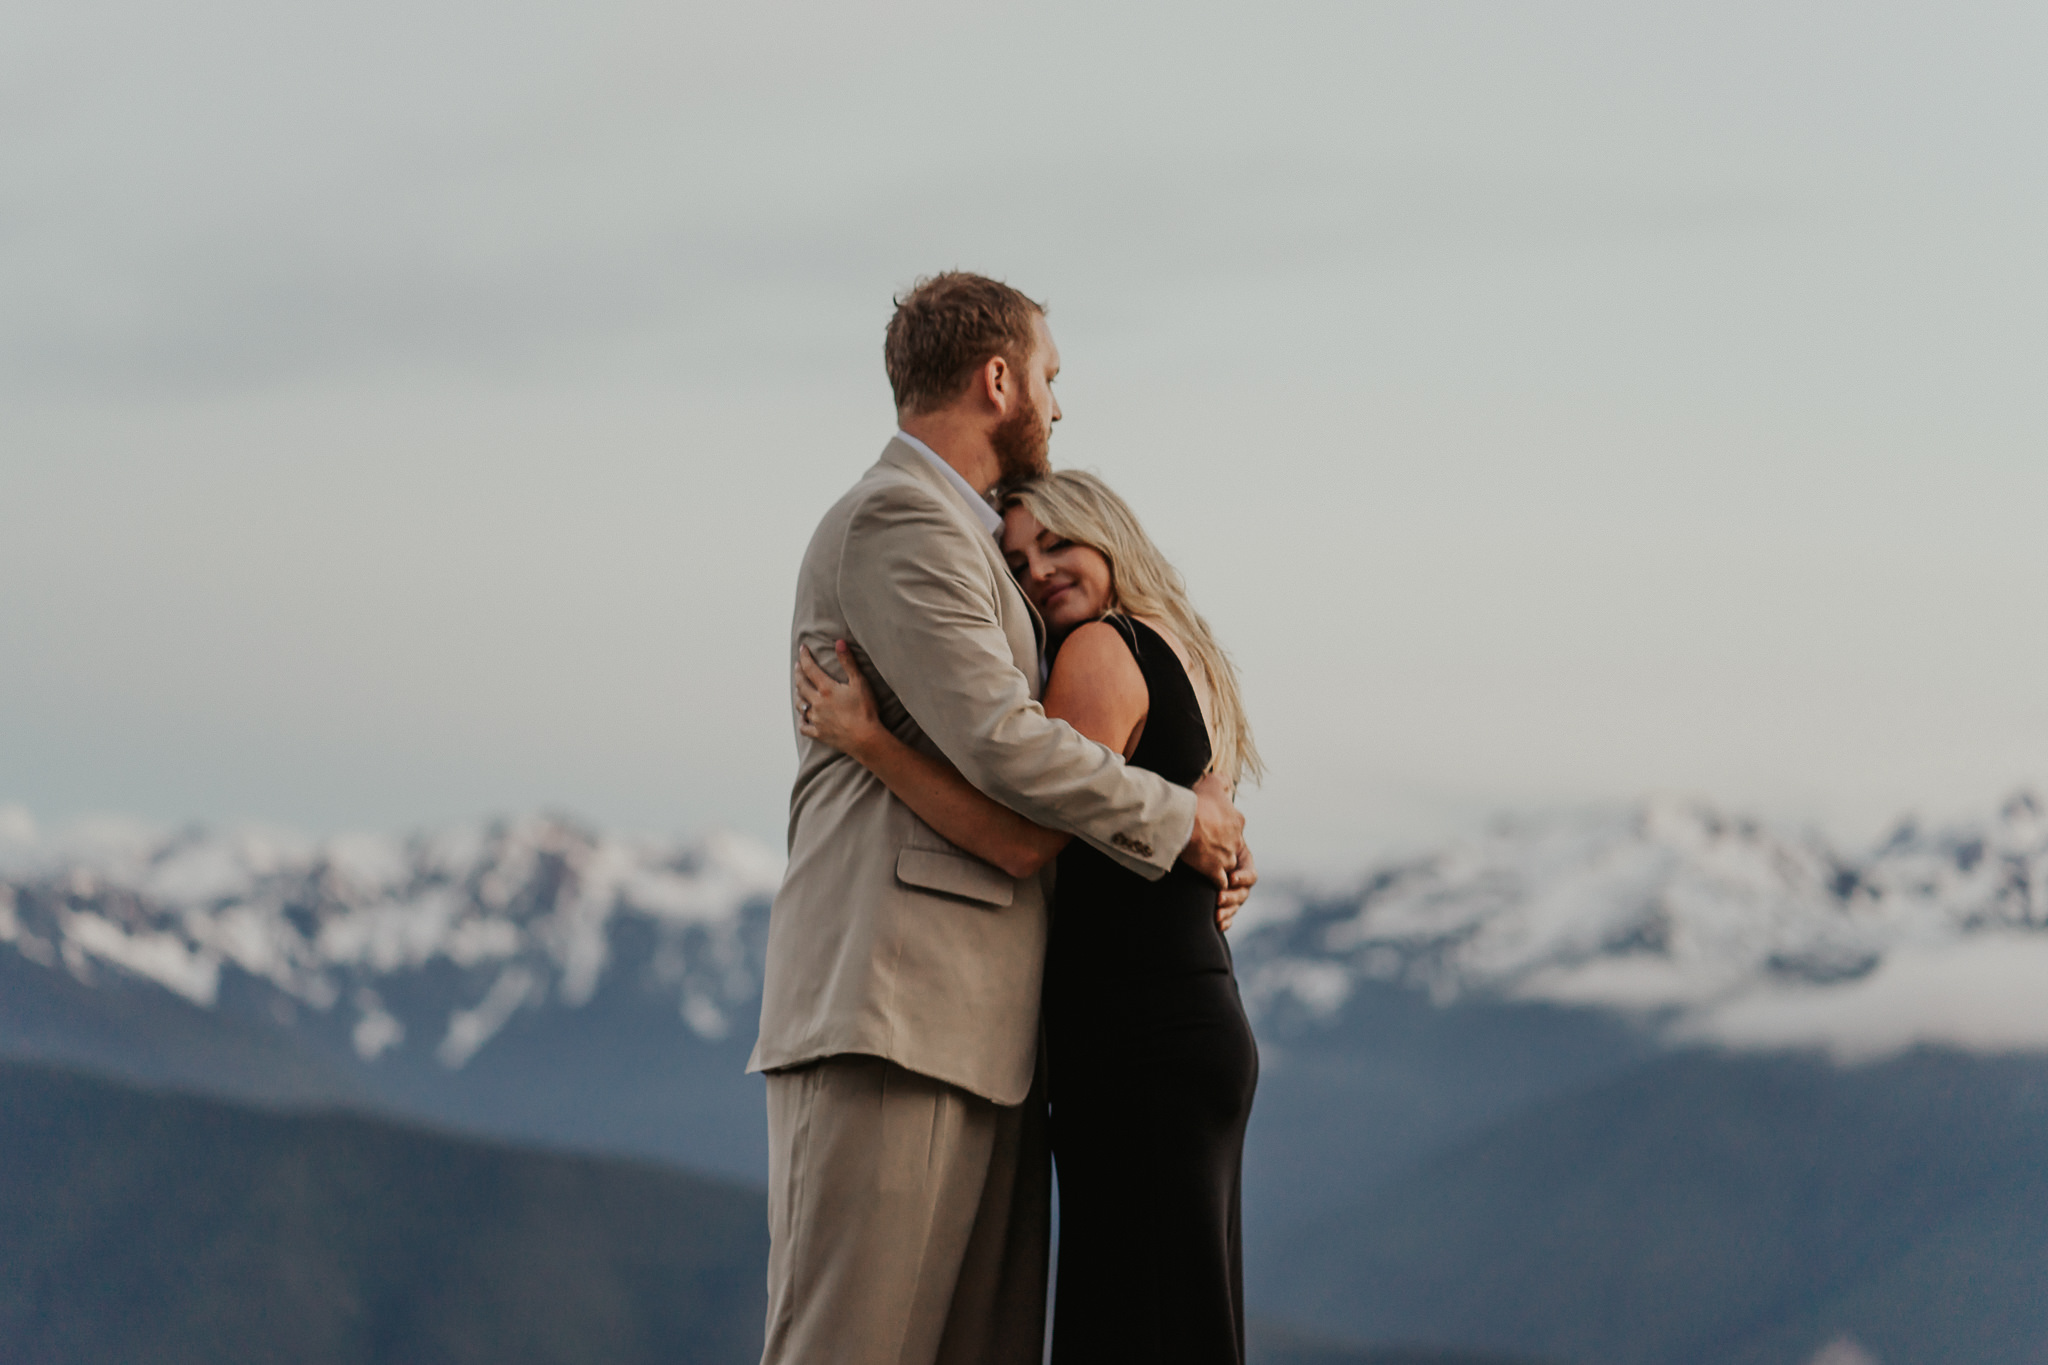 Emotional-Connection-Engagement-Photographer